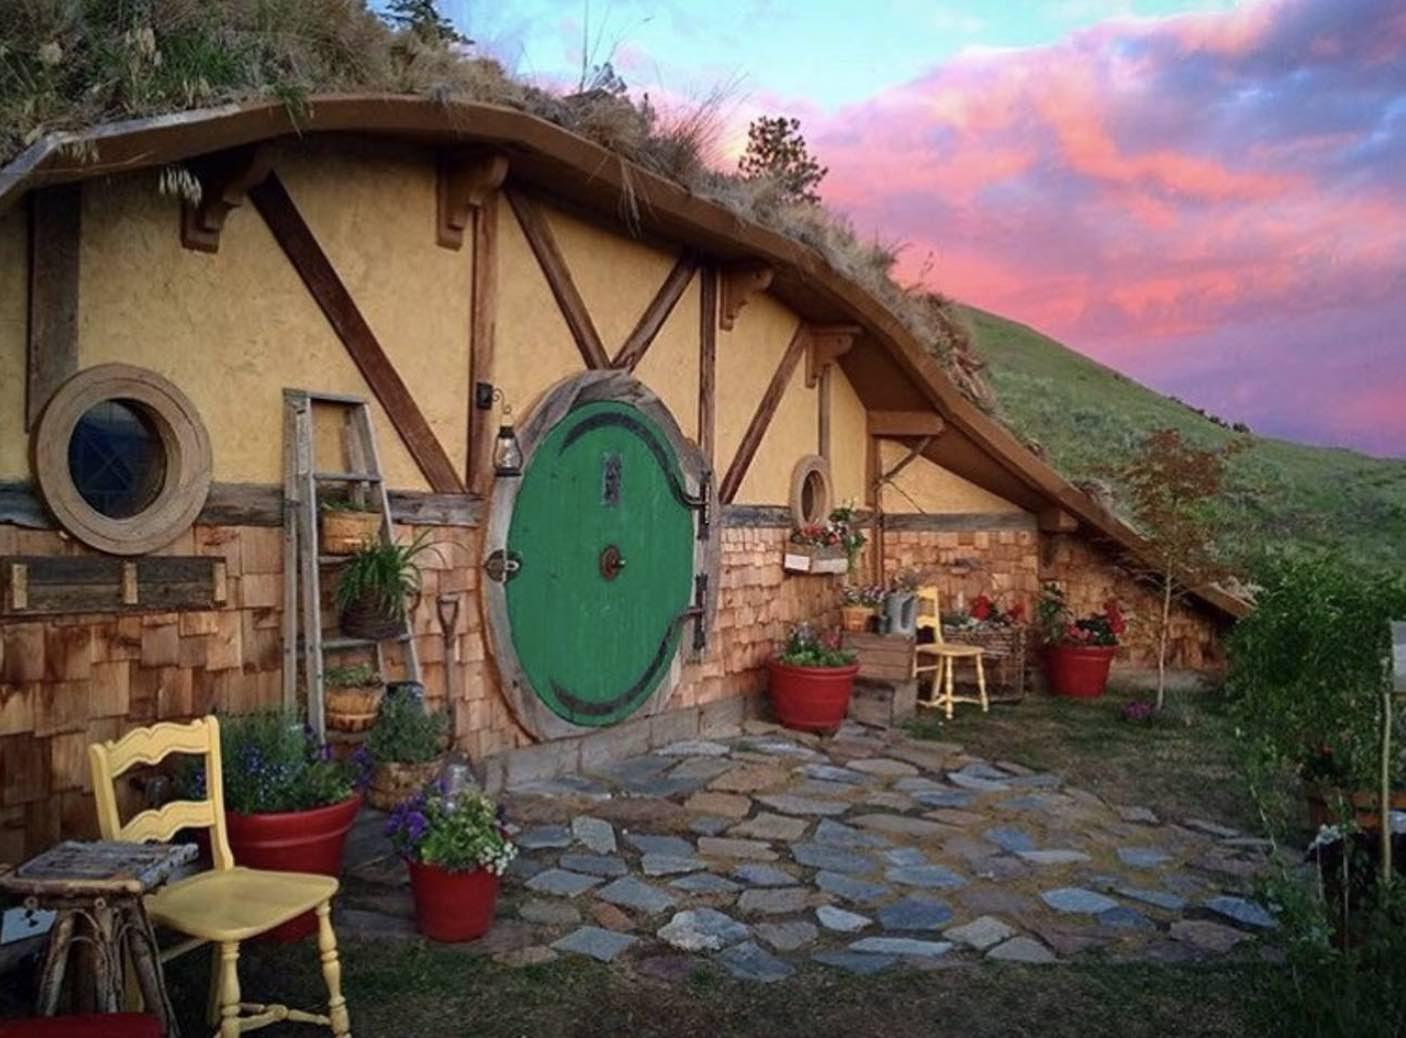 unique airbnb properties